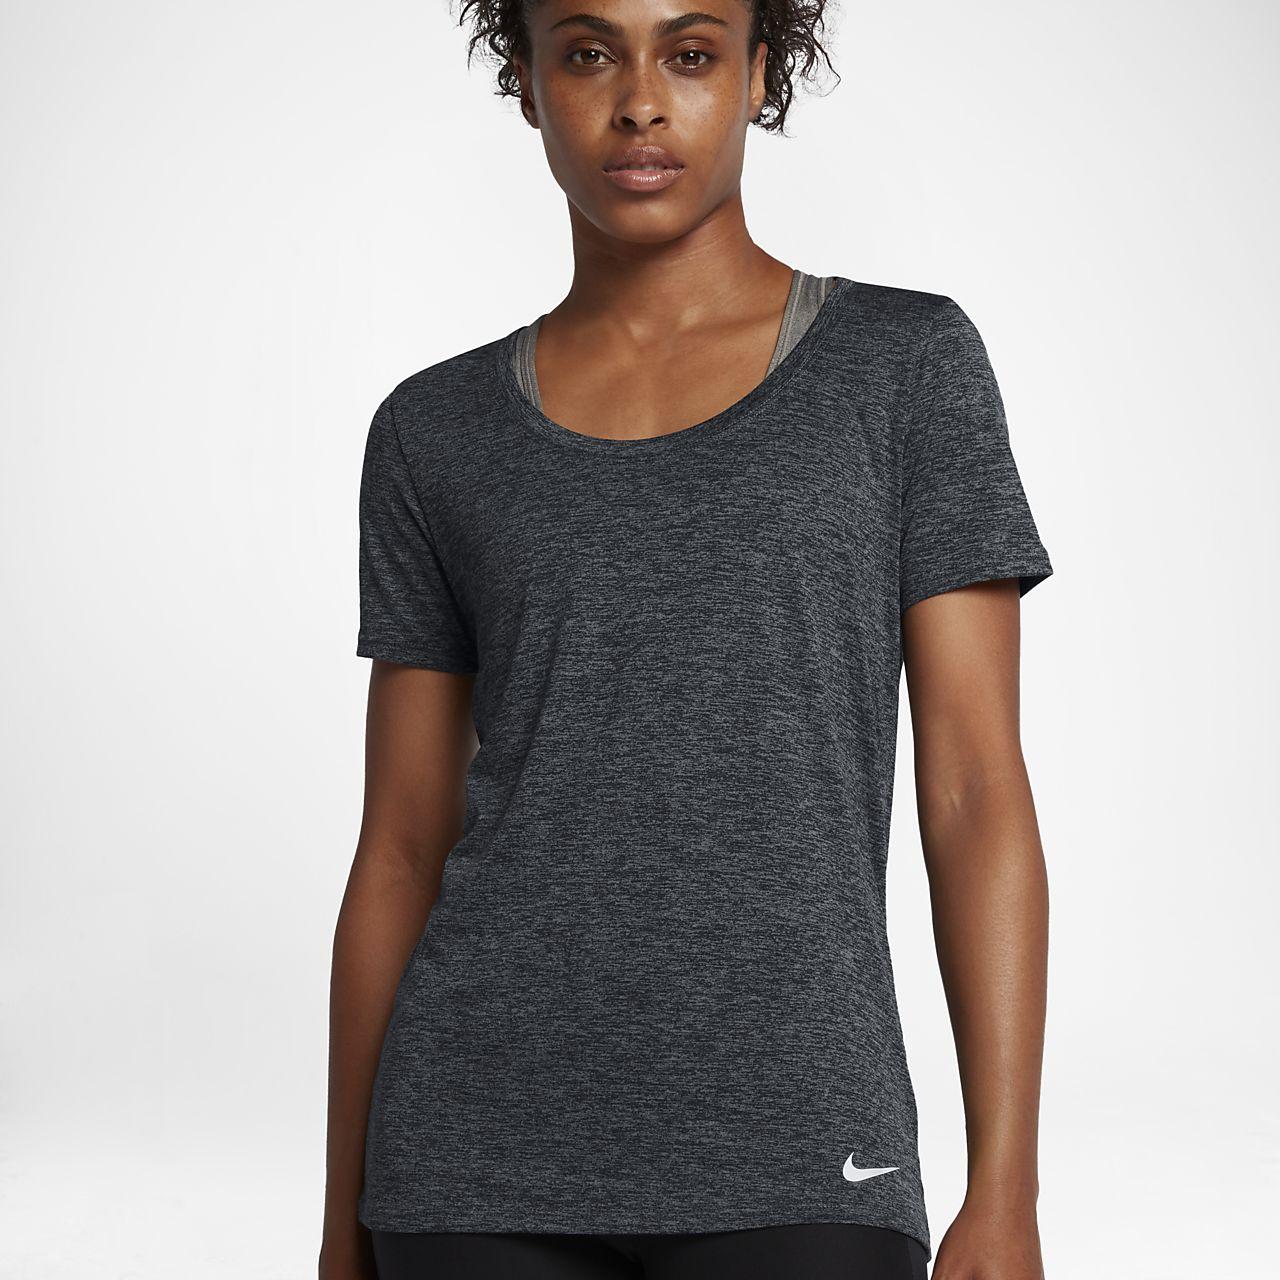 Nike Dri-FIT Legend Women's Short Sleeve Training Top